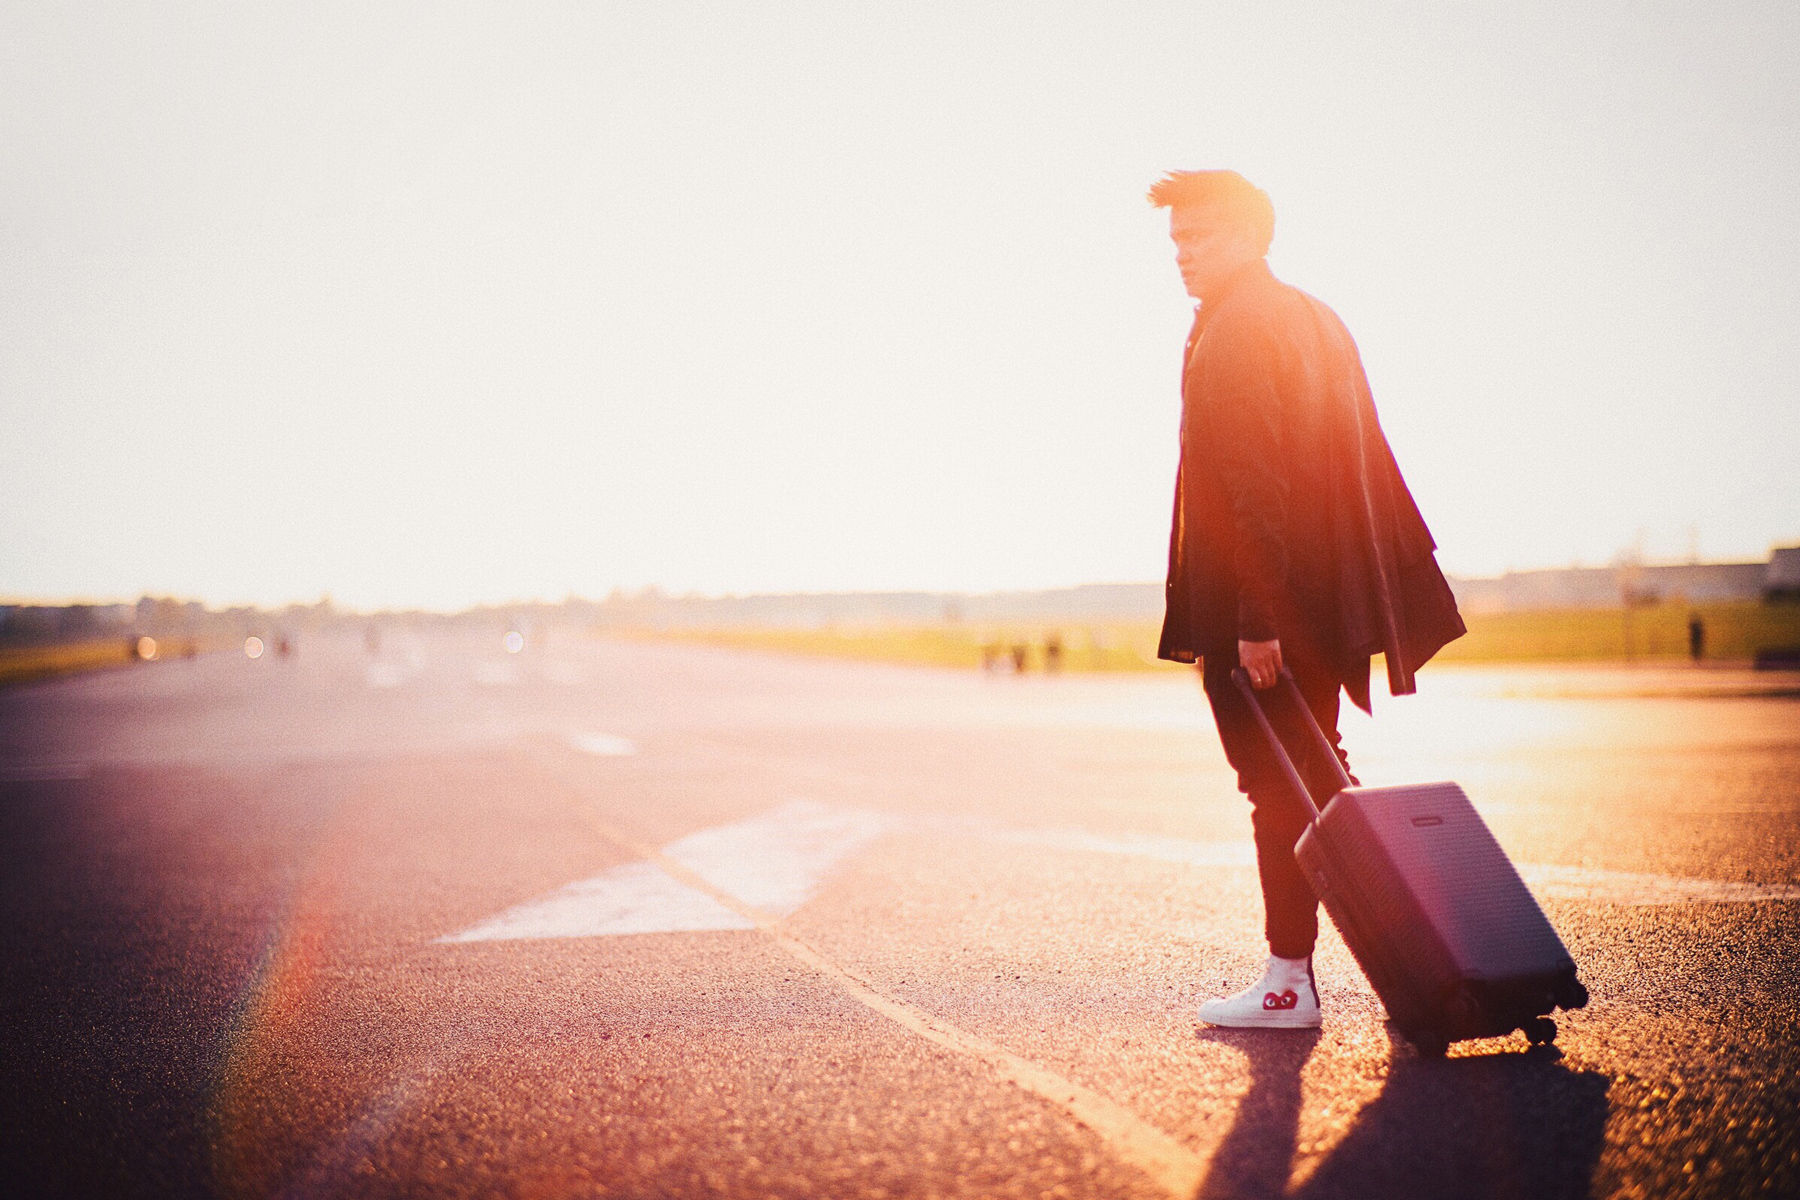 electru_ansonsgentleman_travel